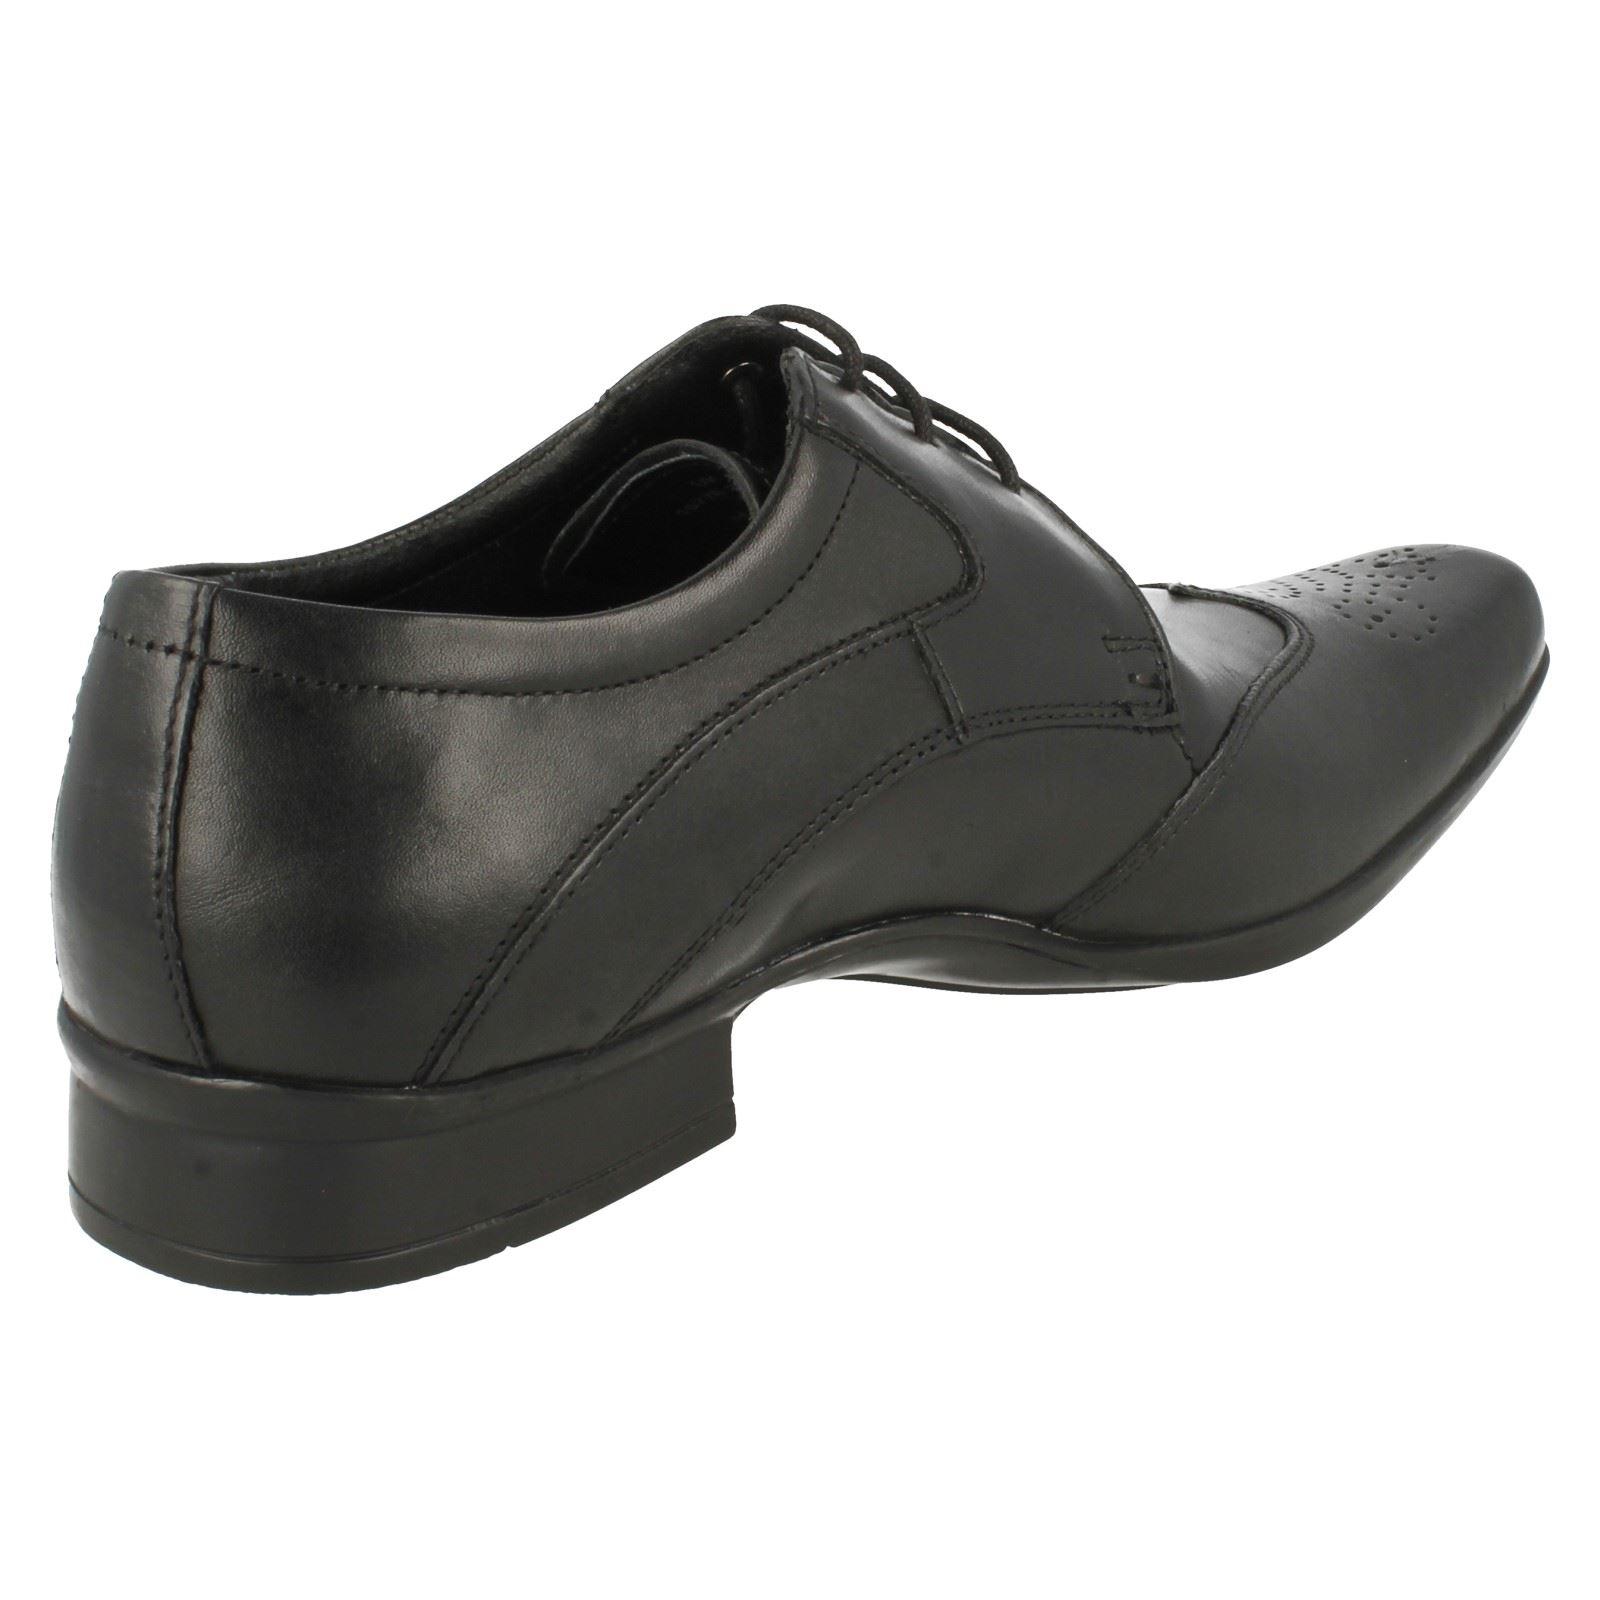 Zapatos para Hombre Clarks Inteligente Affix Moscow'